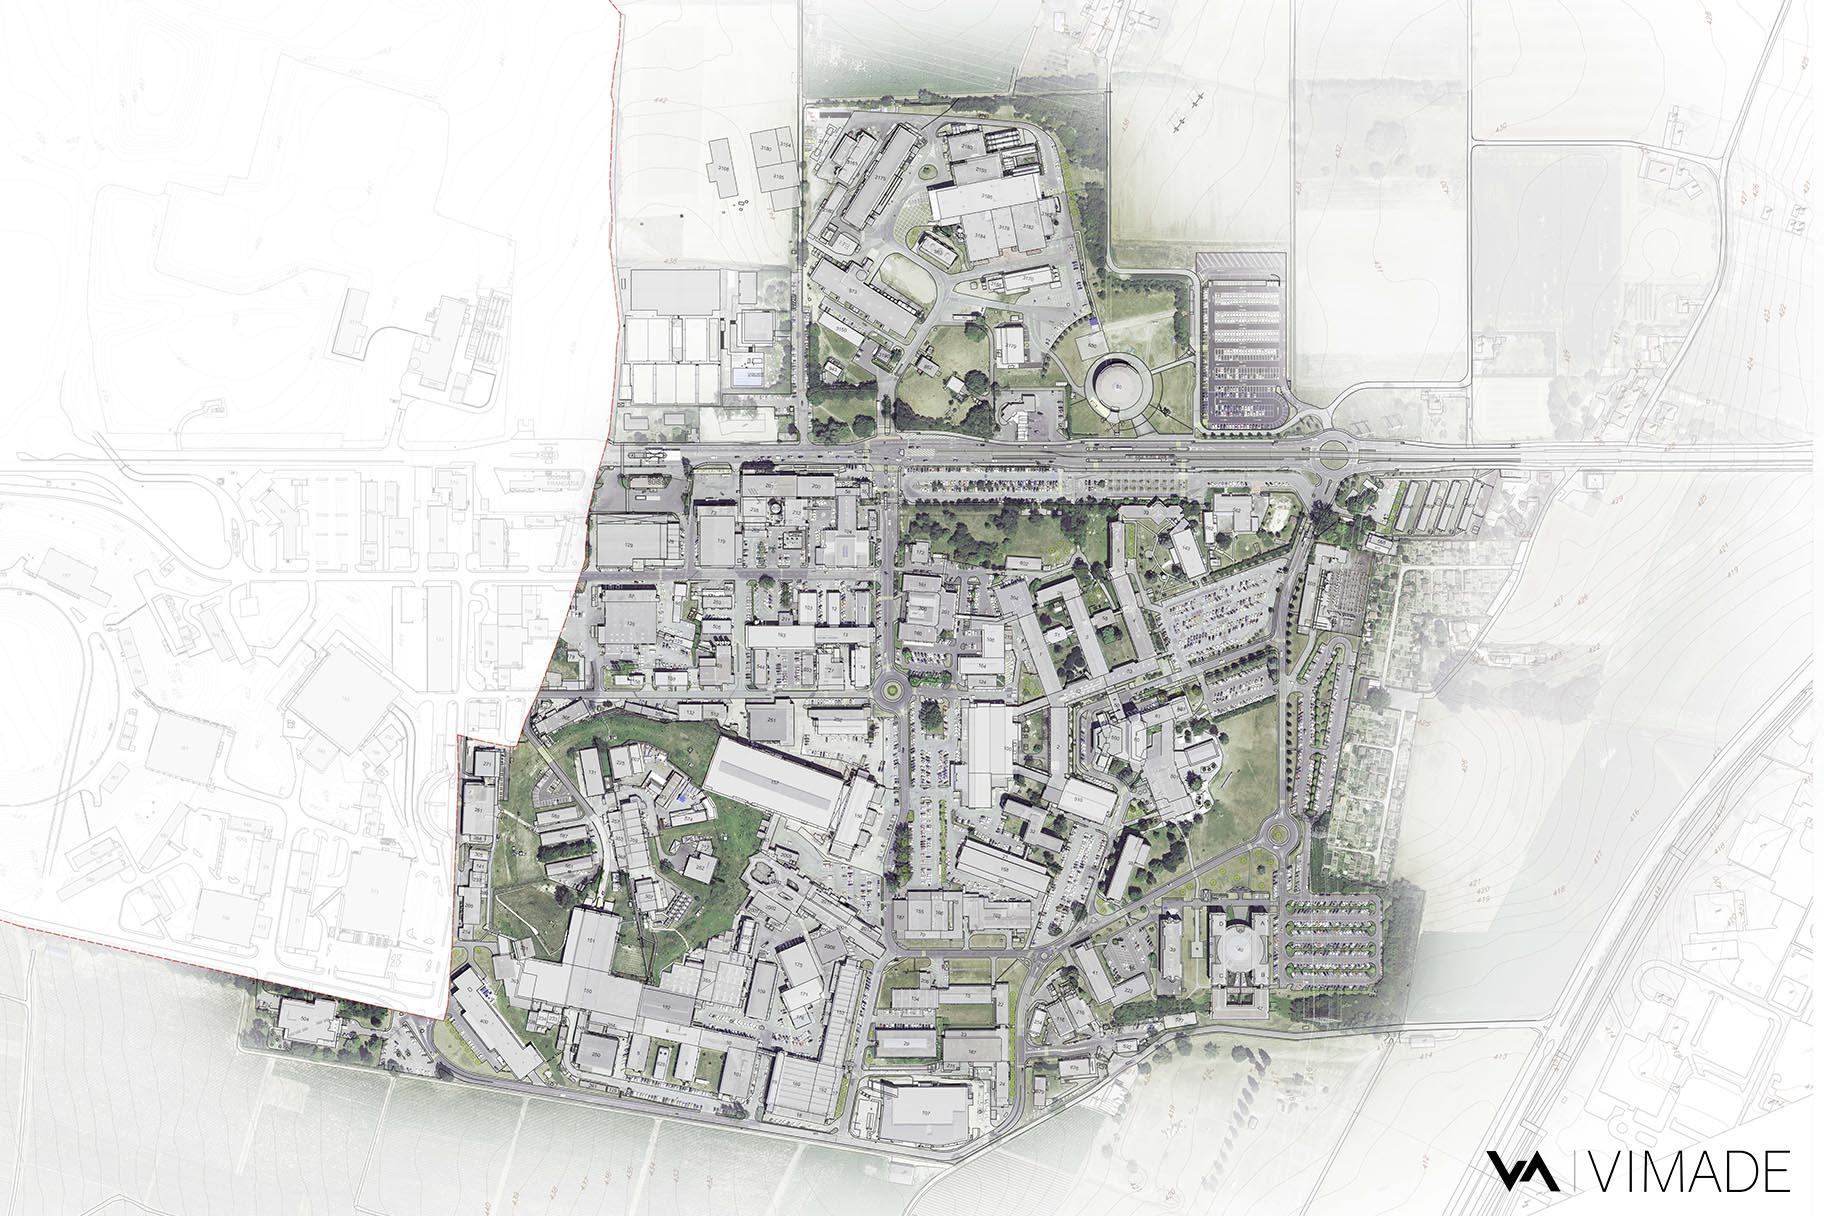 plan-cern-projet-plantations-arbres-vimade-architectes-paysagistes-geneve-meyrin-architecture-paysage